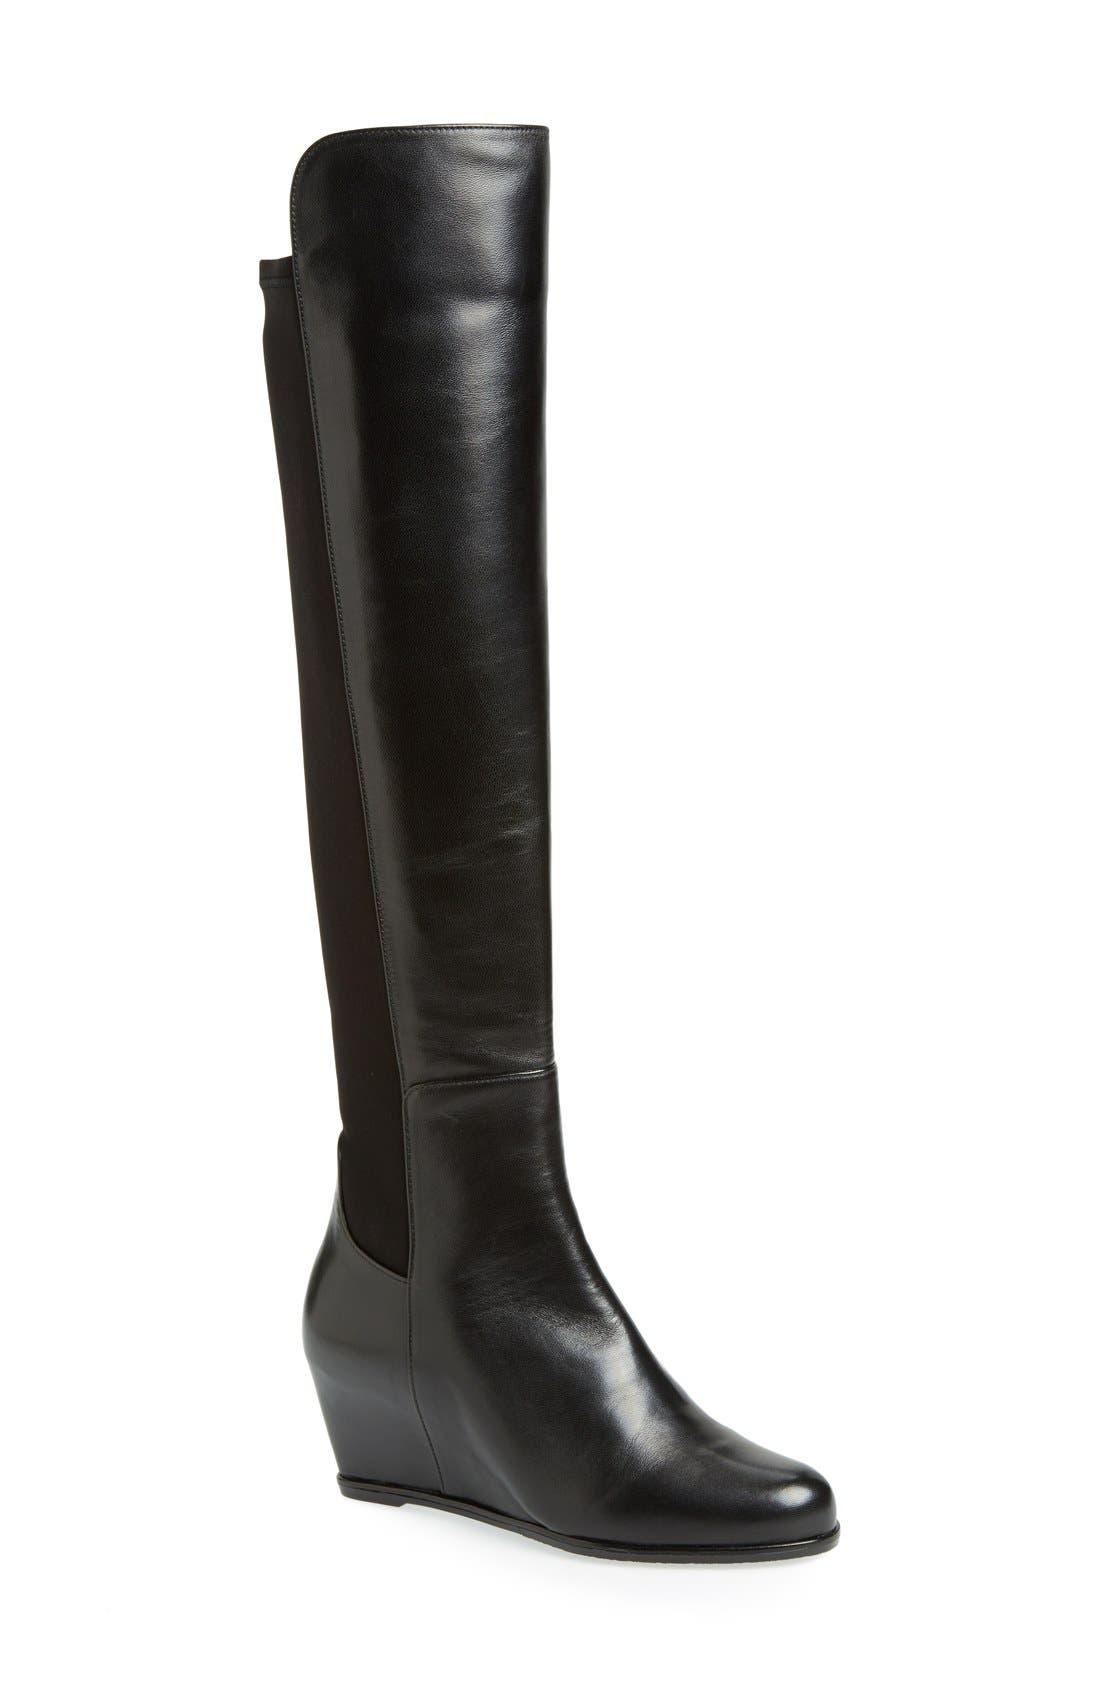 Alternate Image 1 Selected - Stuart Weitzman 'Semi' Over the Knee Boot (Women)